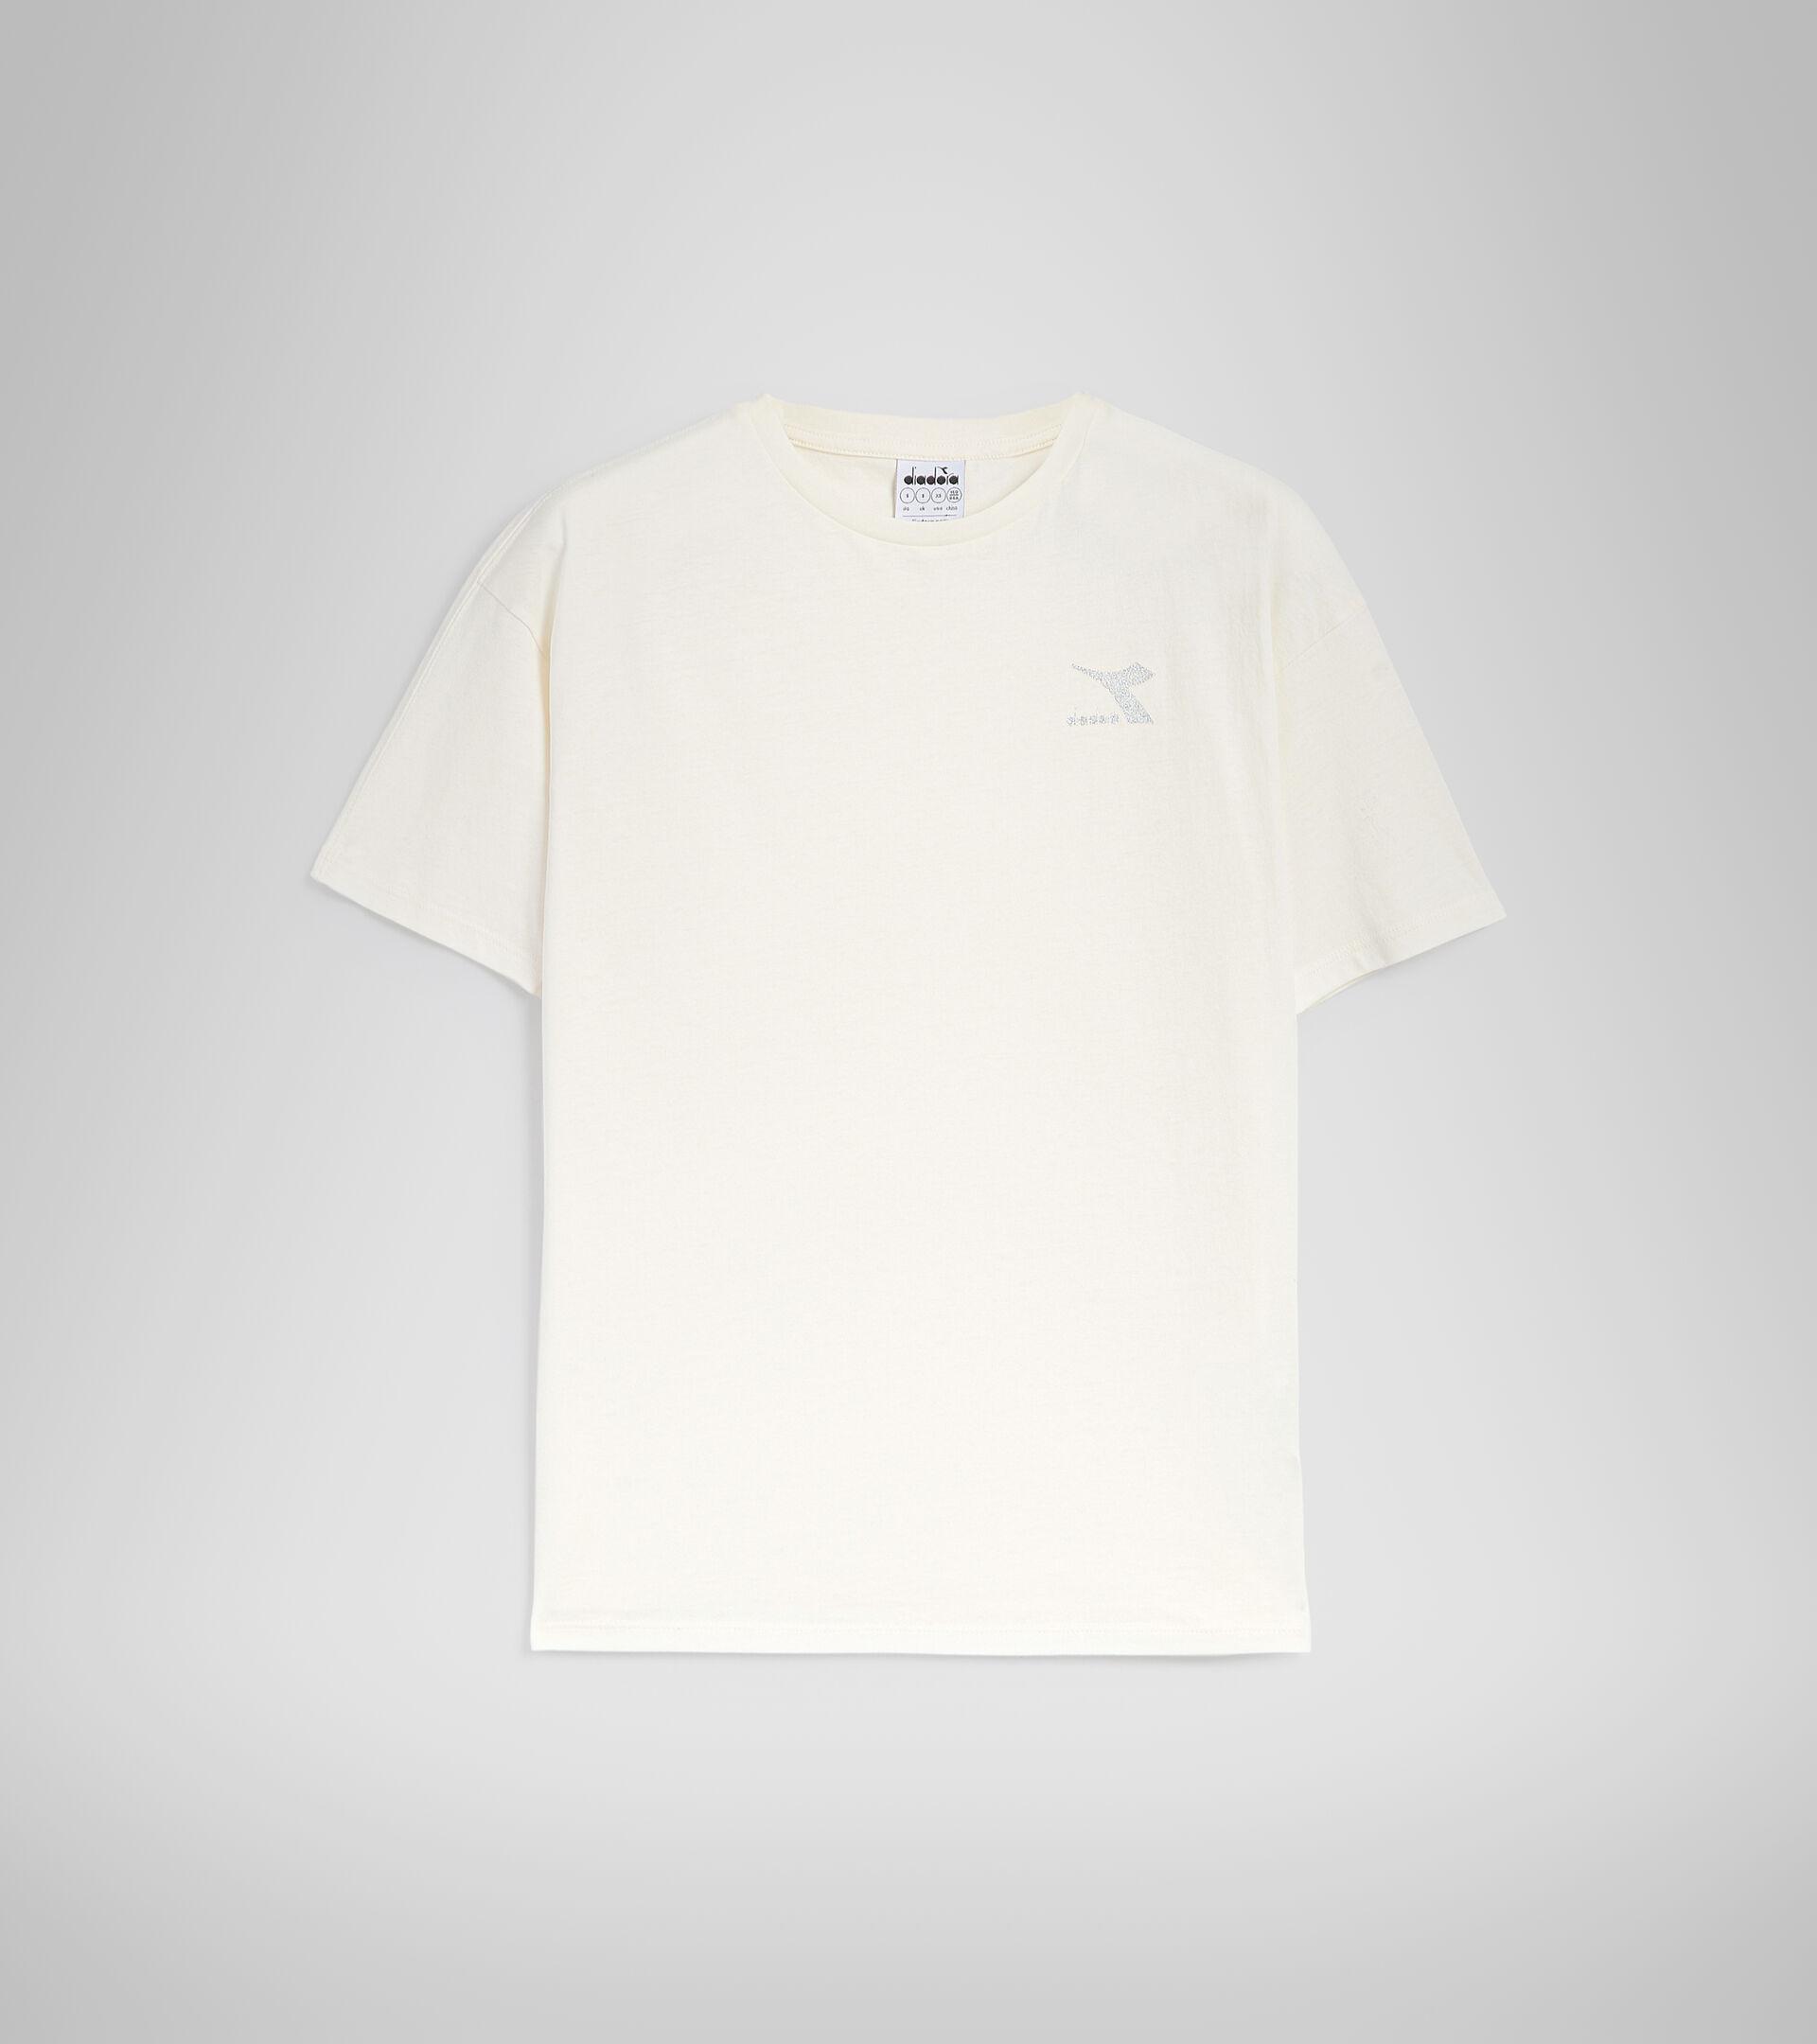 Camiseta - Mujer L.T-SHIRT SS BLINK BLANCO MURMURAR - Diadora